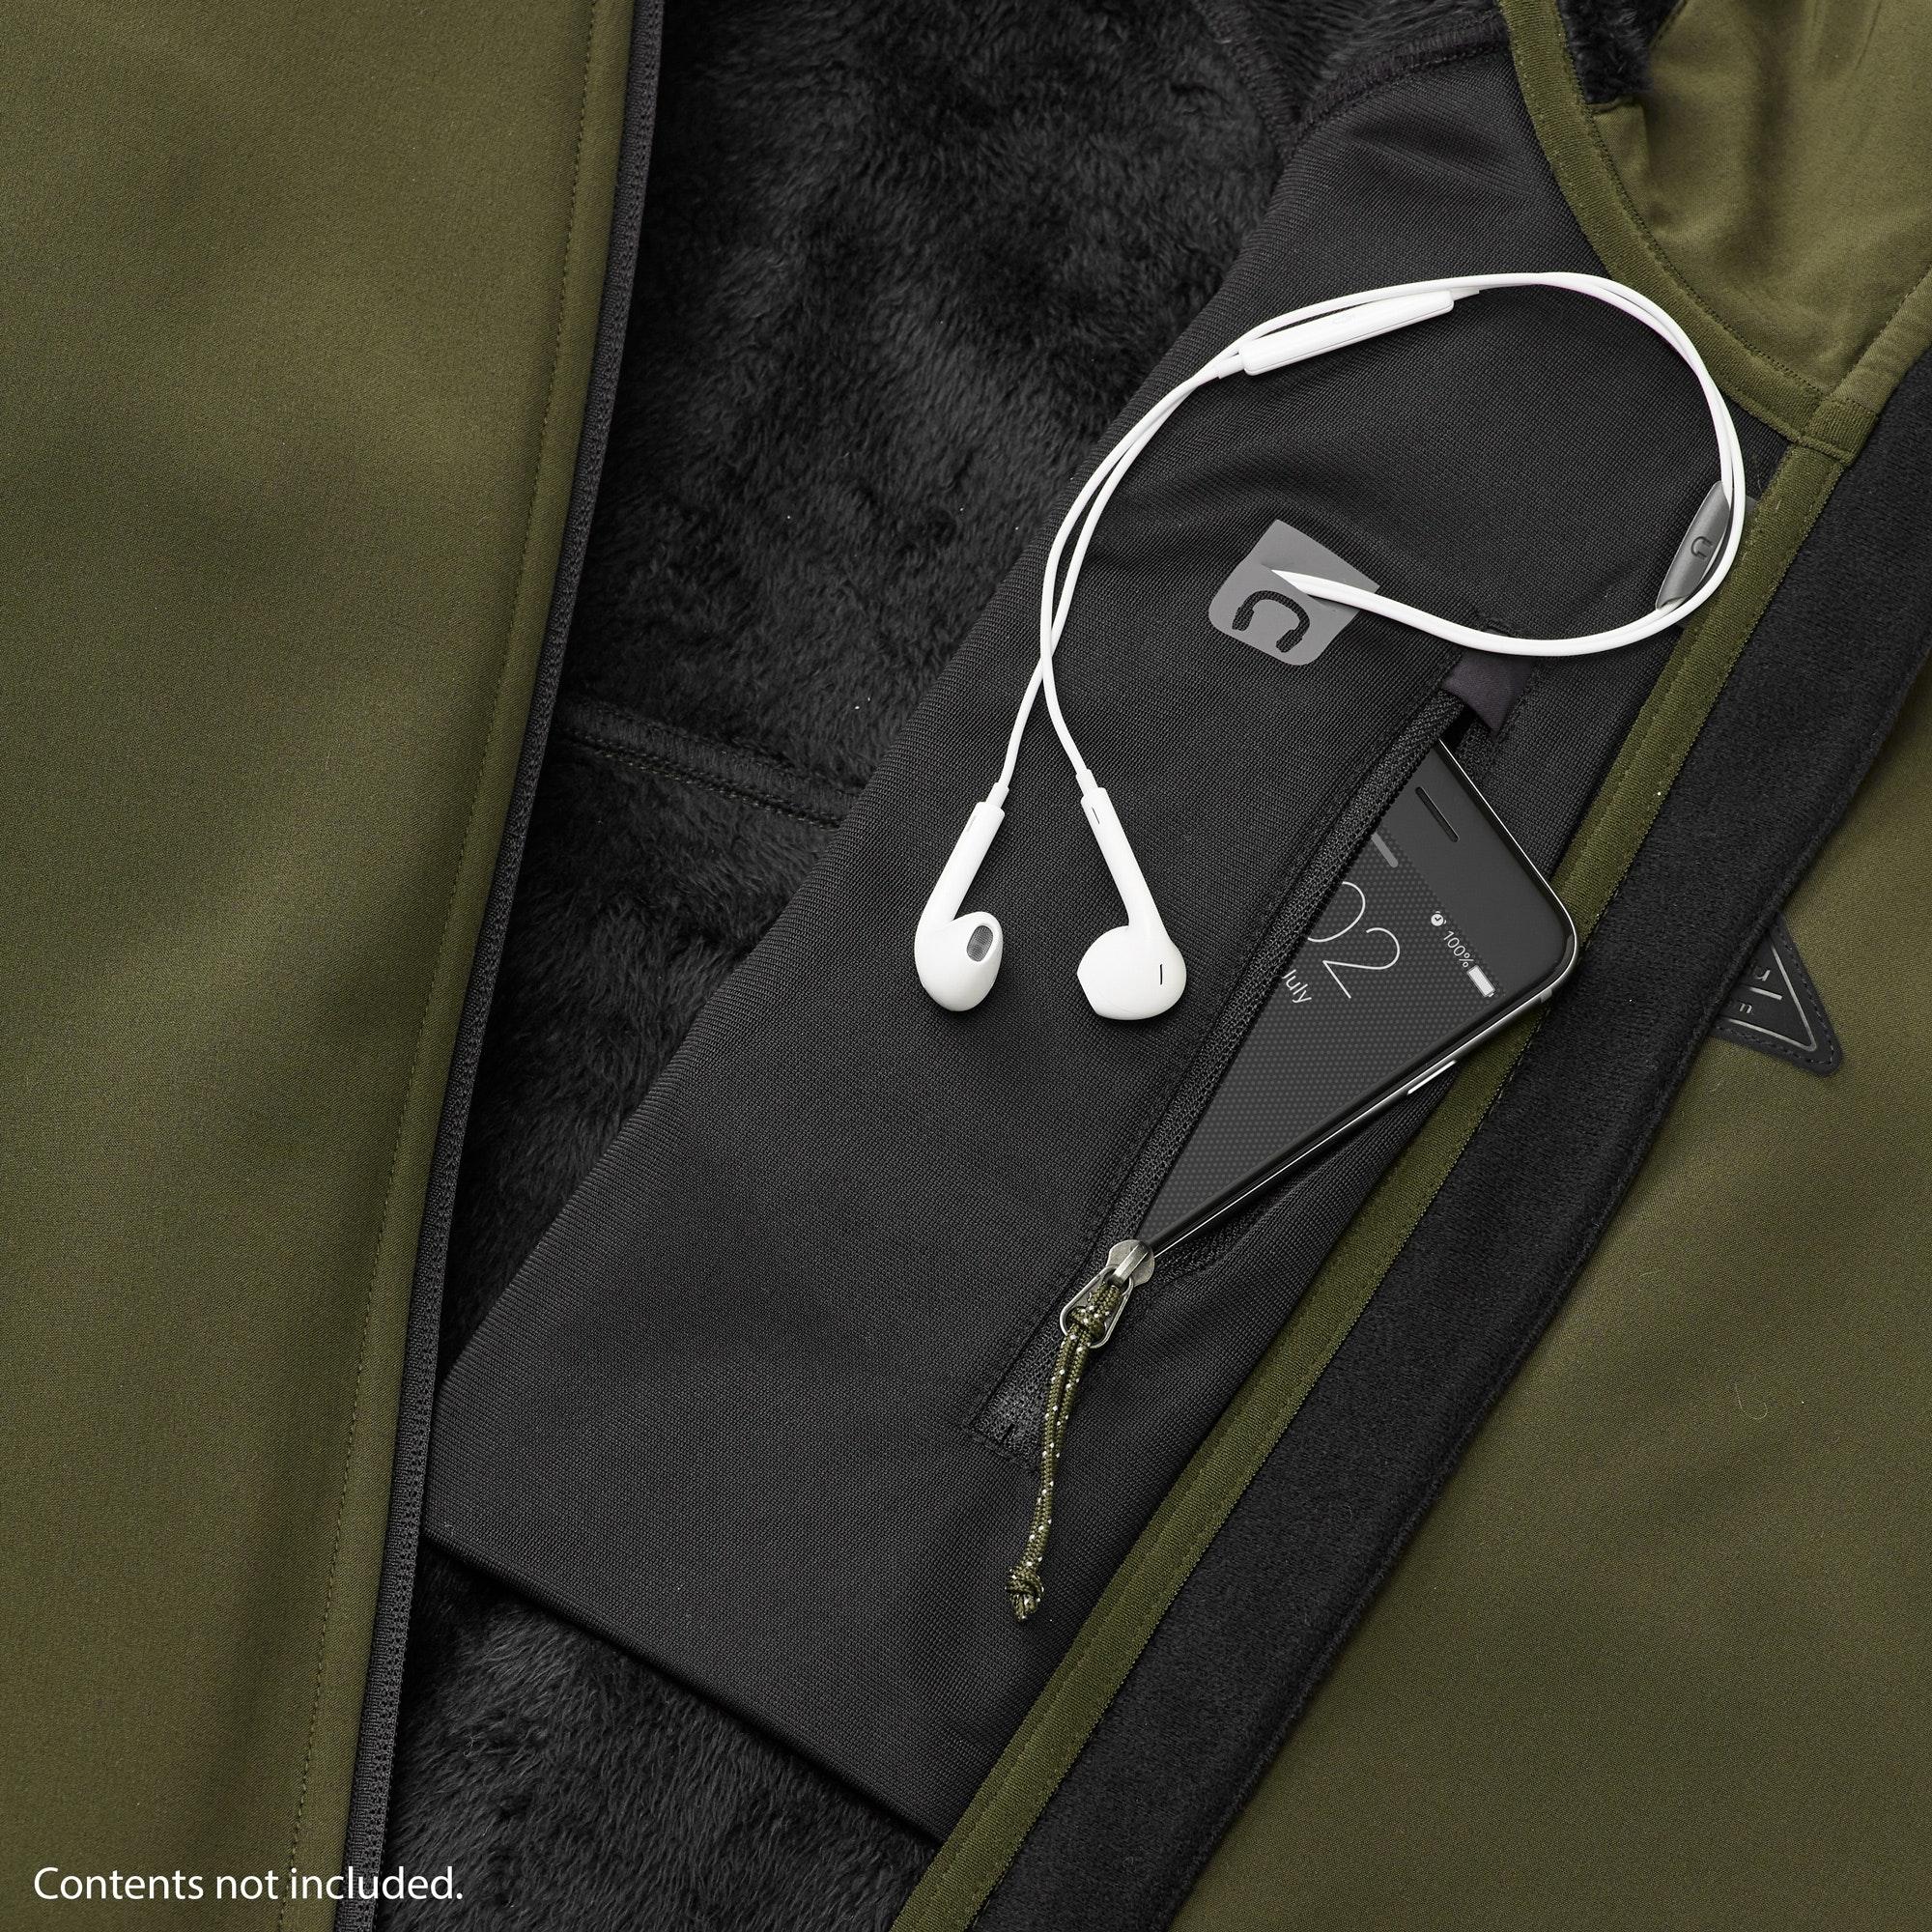 NEW-Kathmandu-Malazan-Mens-Hooded-Water-Repellent-Softshell-Fleece-Jacket-Top-v4